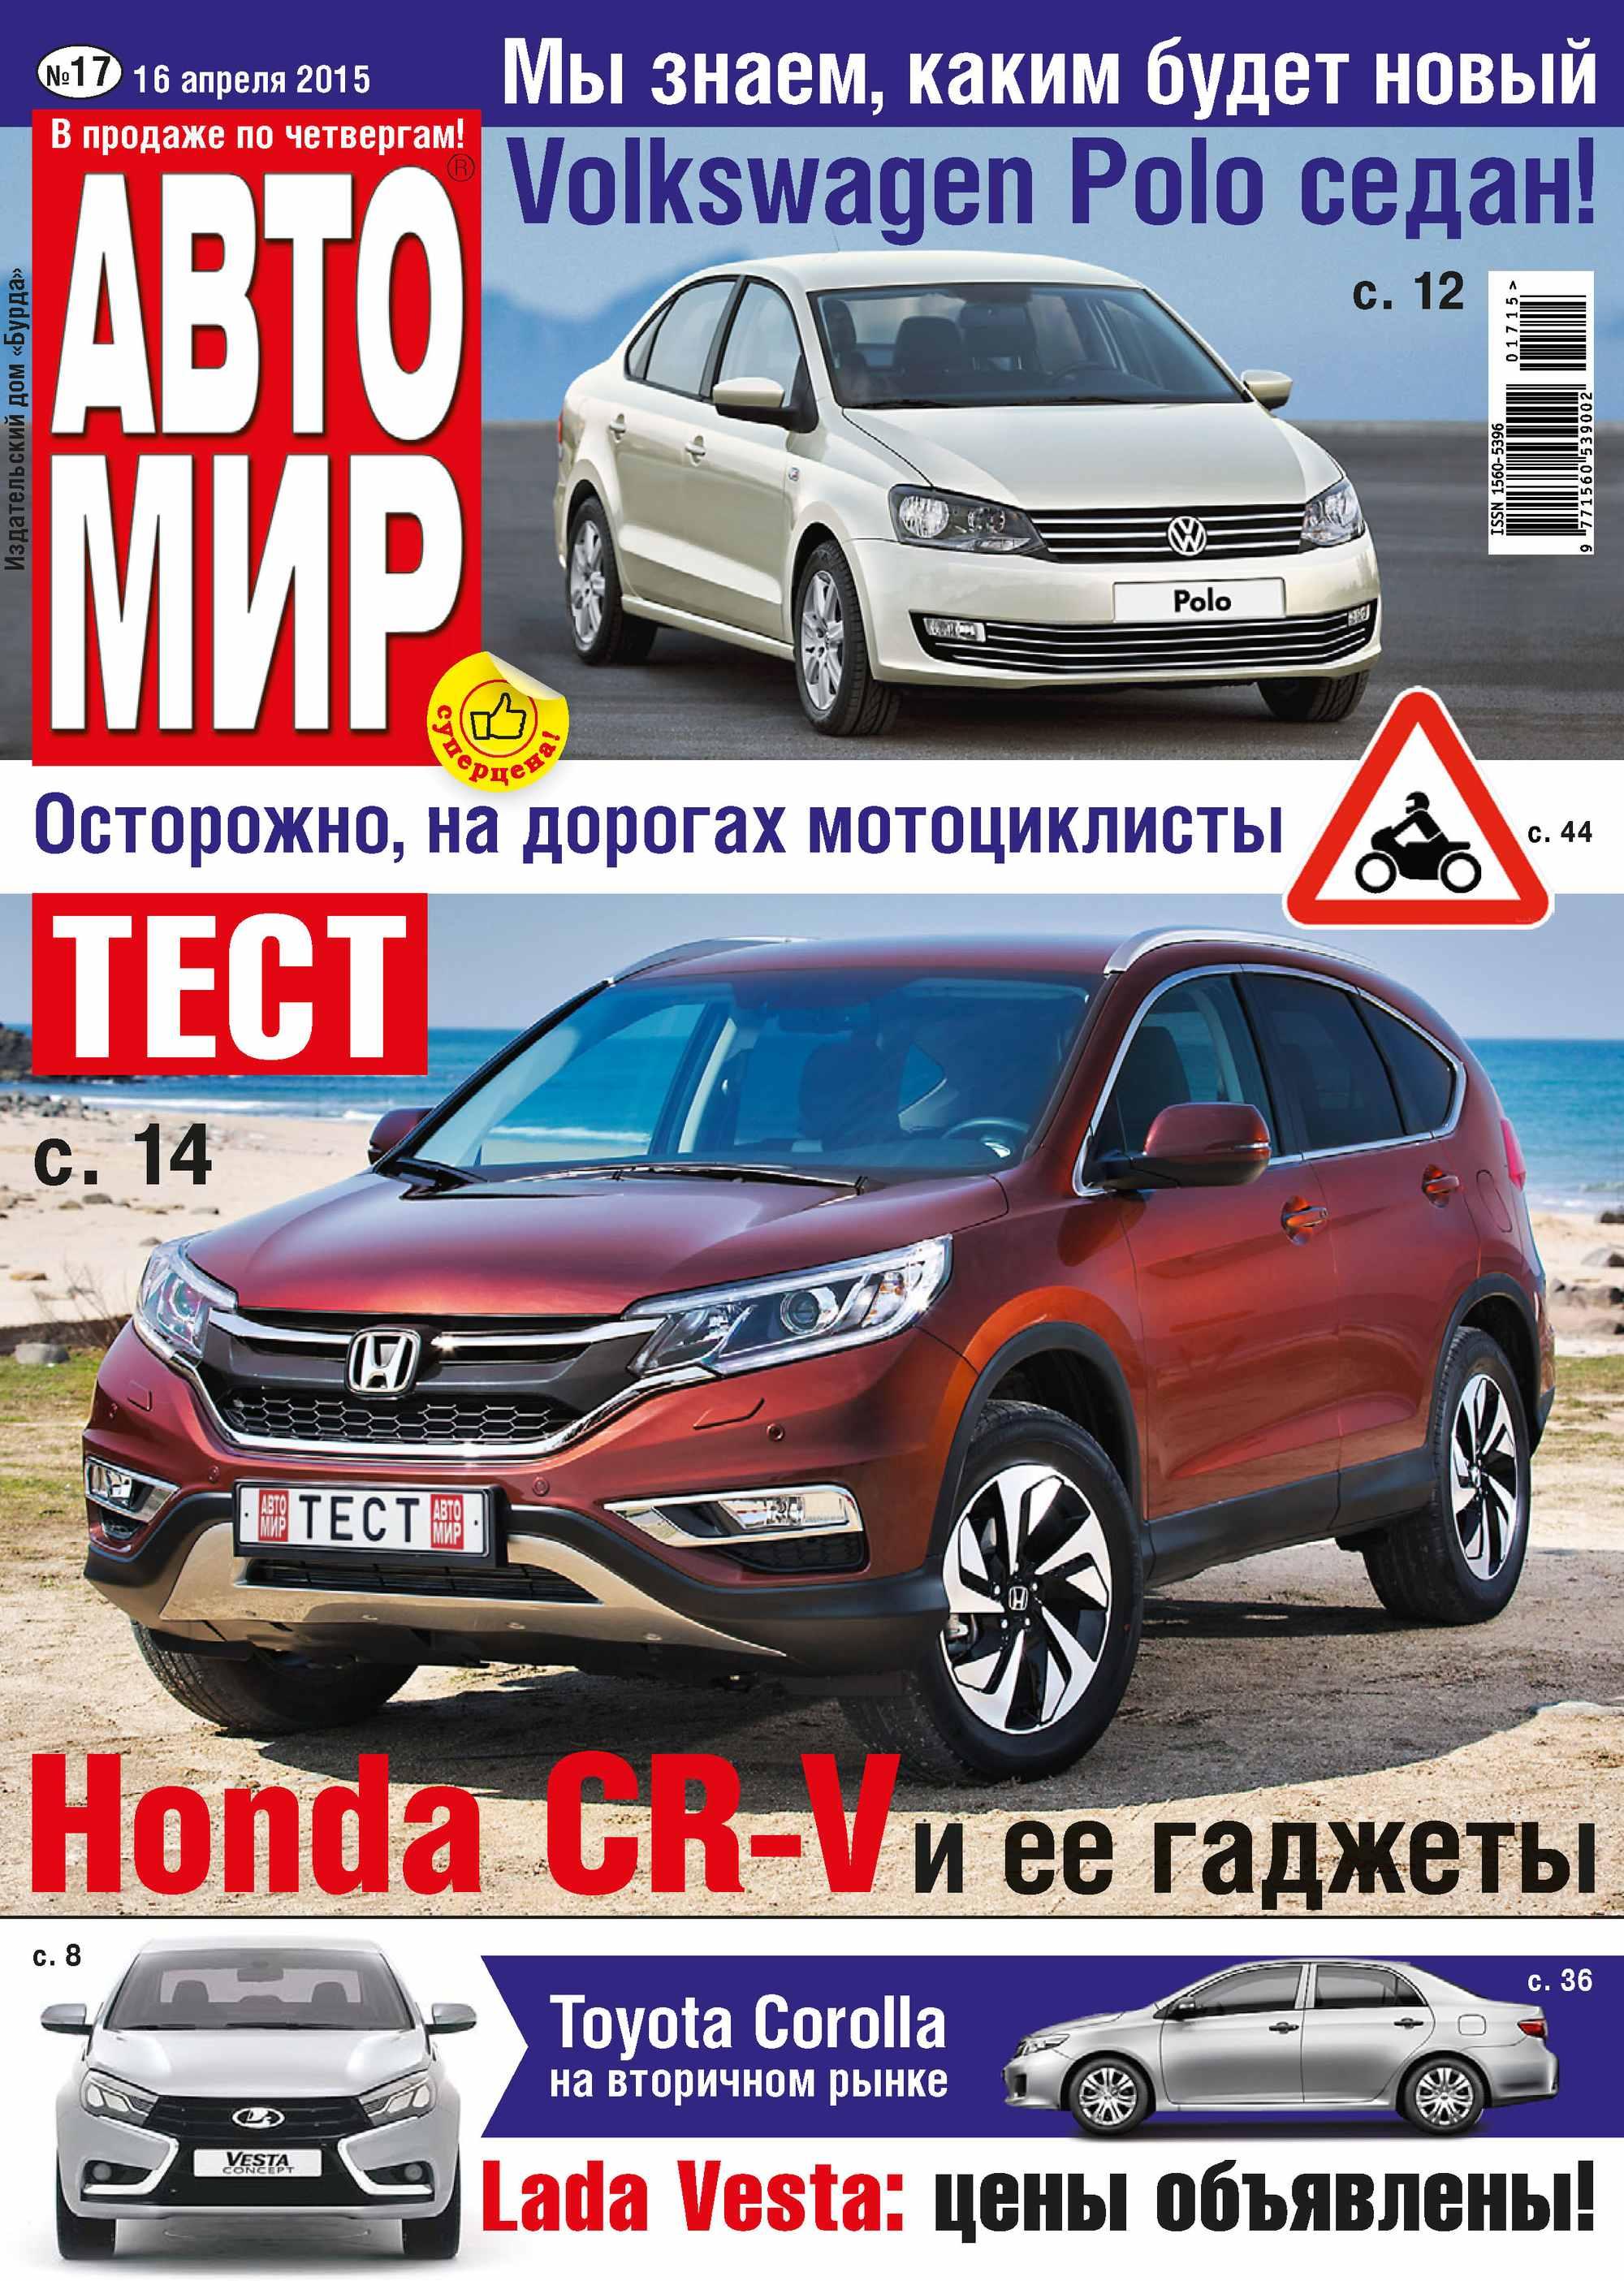 АвтоМир №17/2015